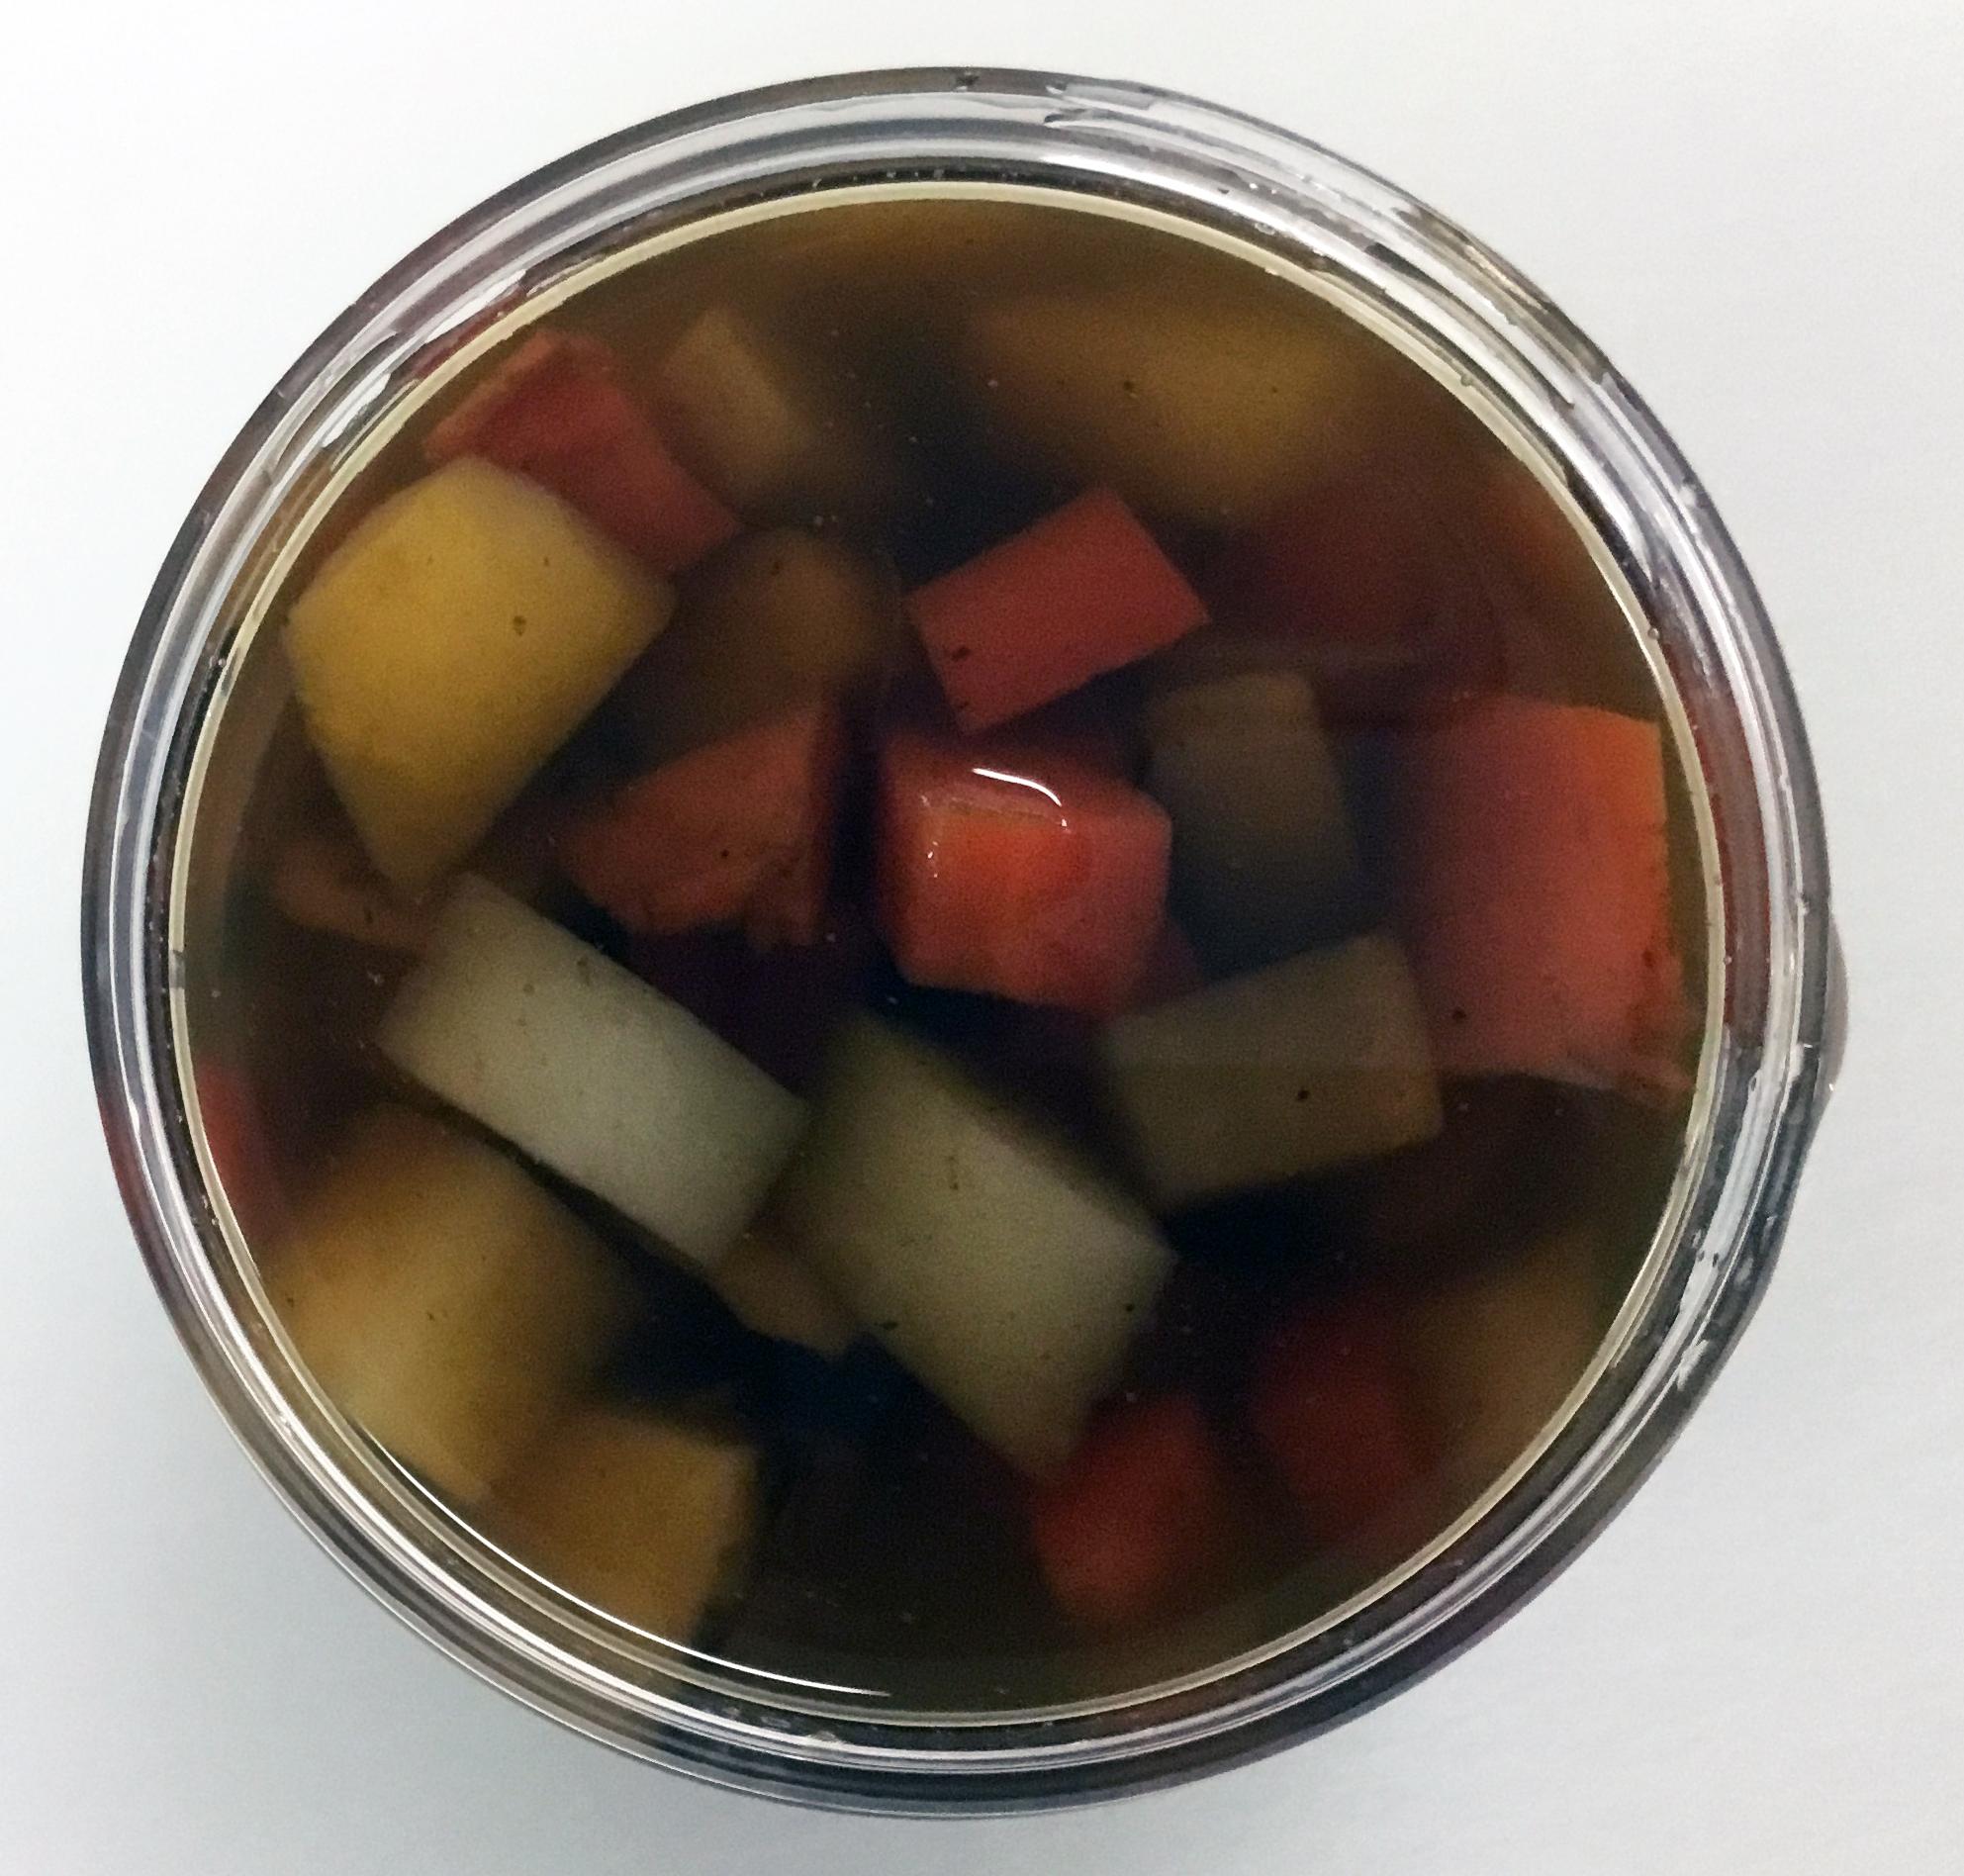 Dashi broth with rutabaga, turnip, carrot, daikon and sweet potato.